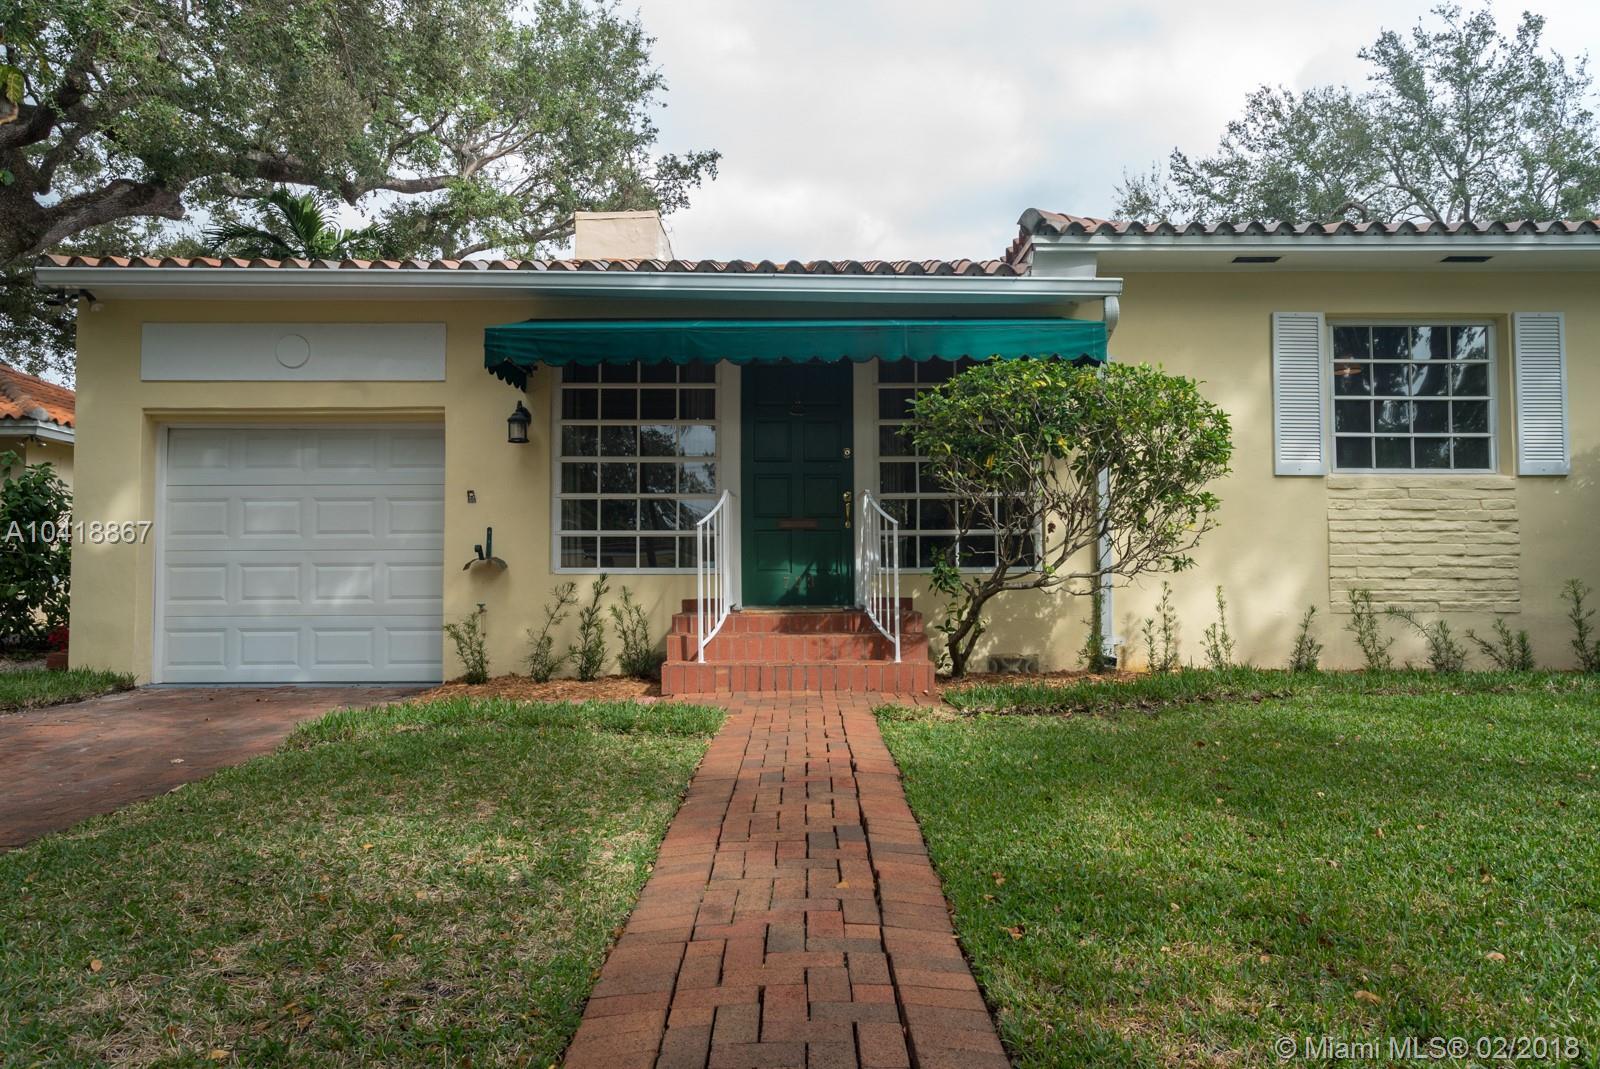 723 Santander Ave, Coral Gables FL, 33134